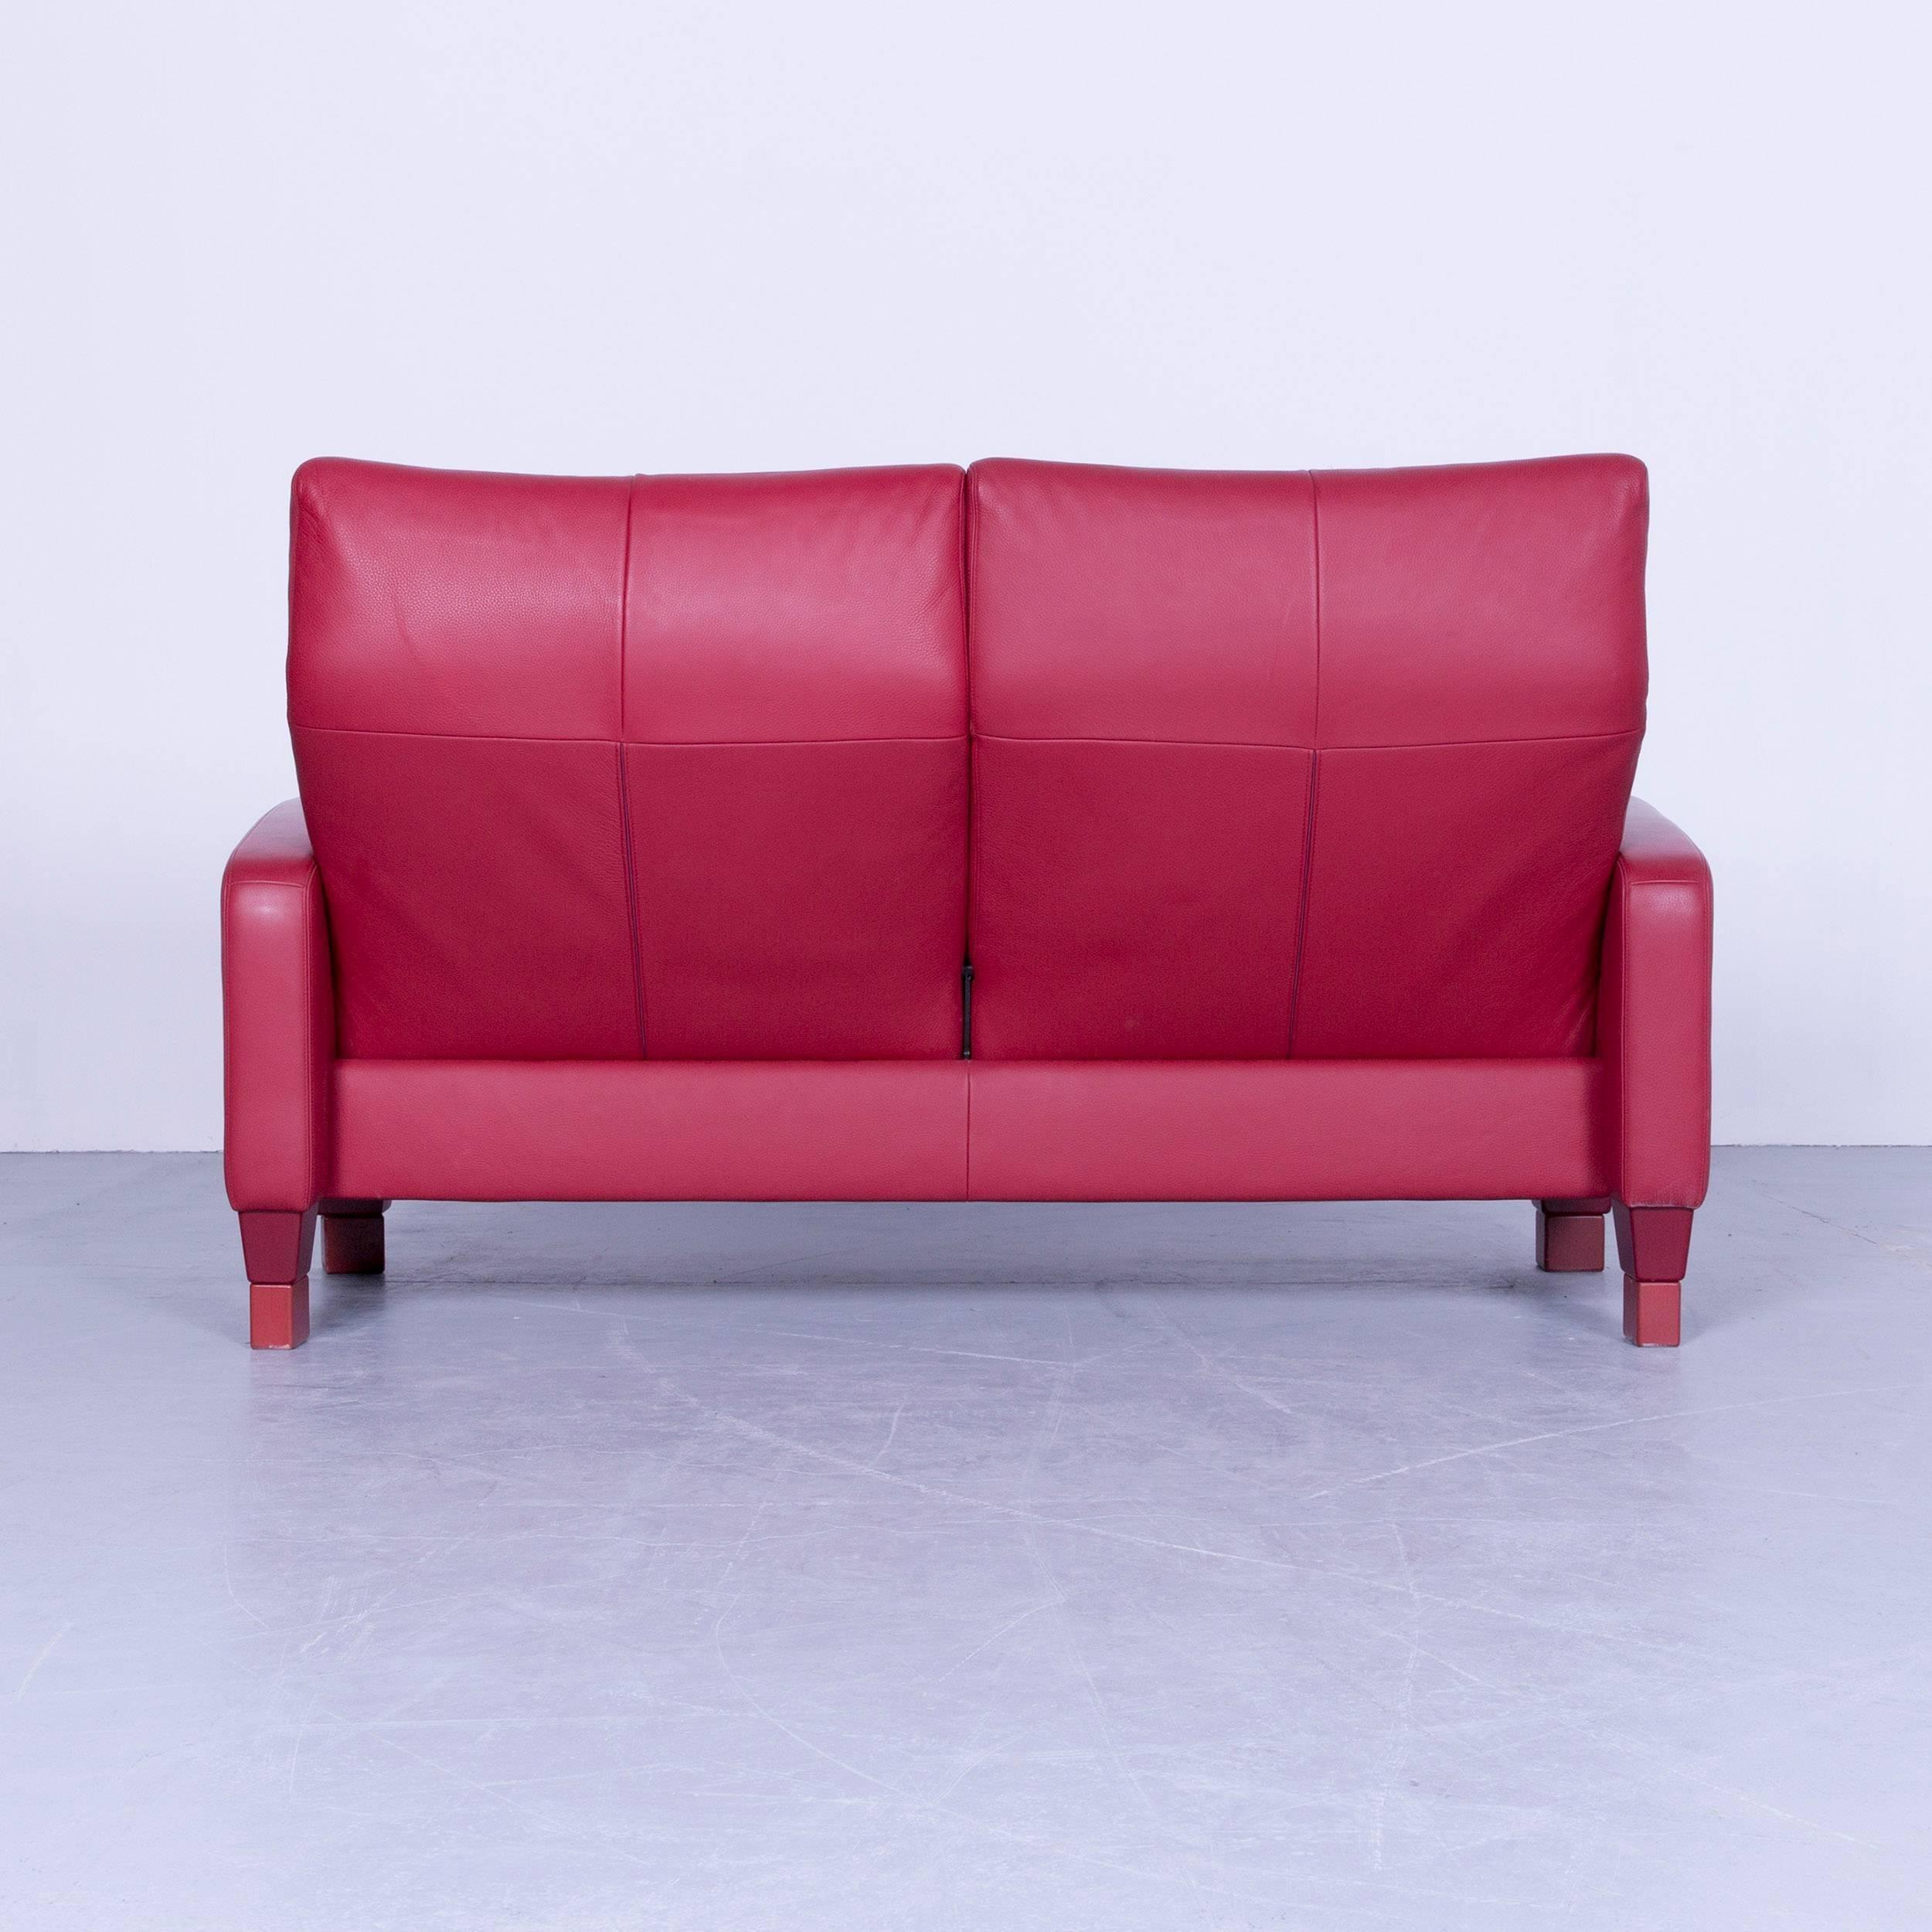 Ikea Sofa Karlstad Anleitung Bett Oder Schlafsofa Das Bild Wird